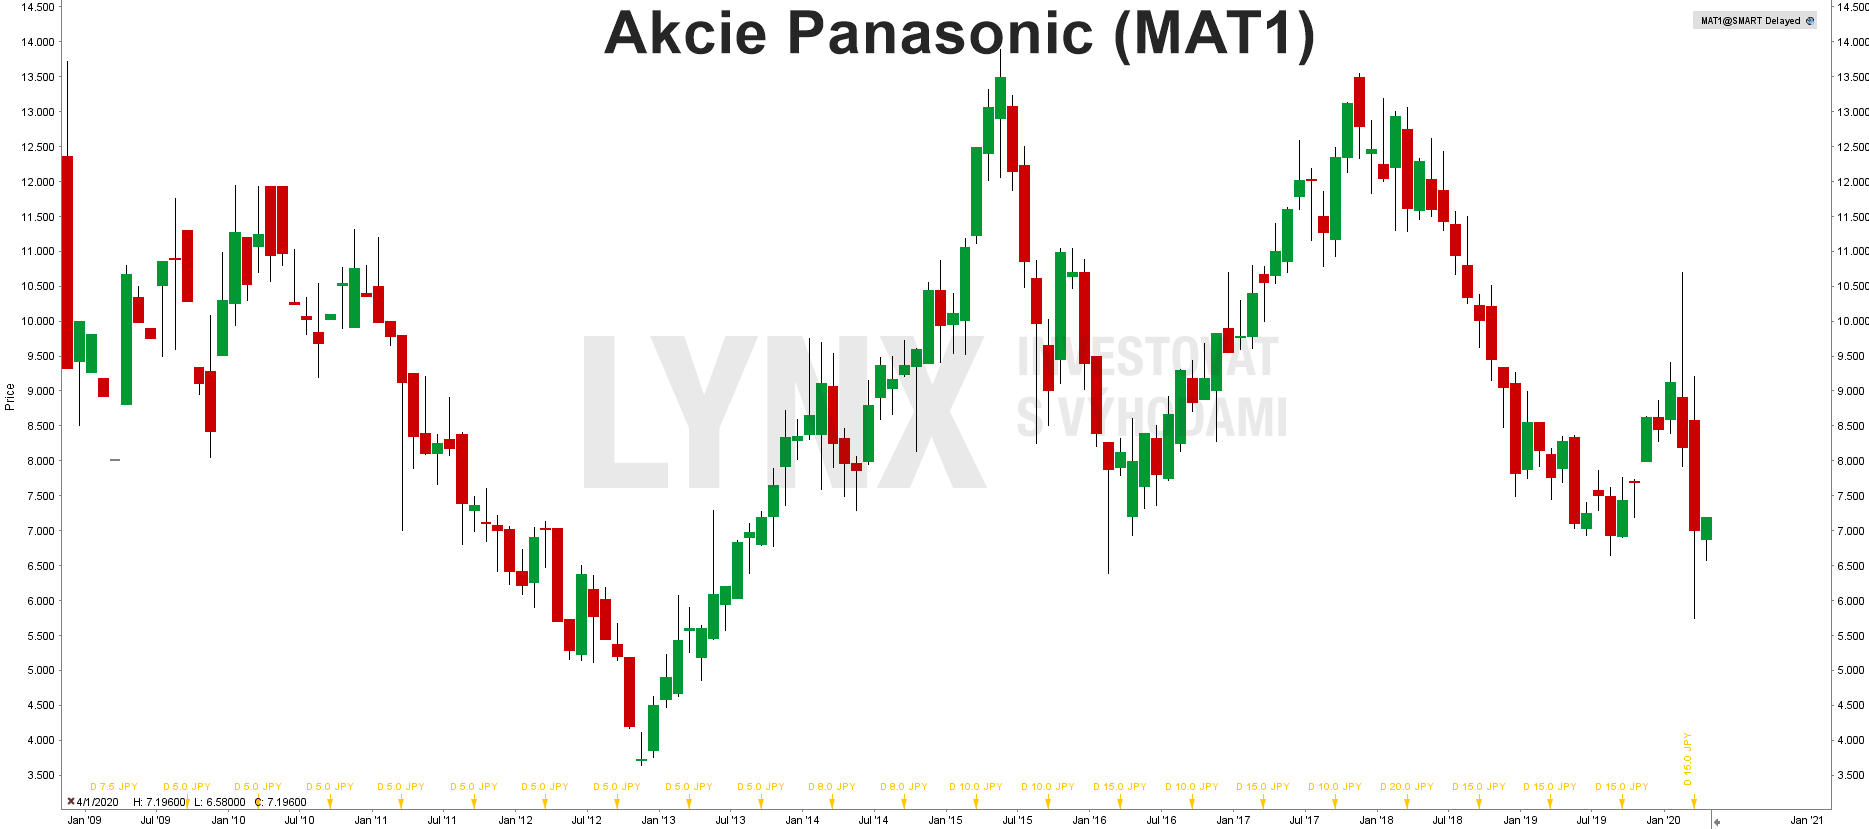 Akcie Panasonic (MAT1)